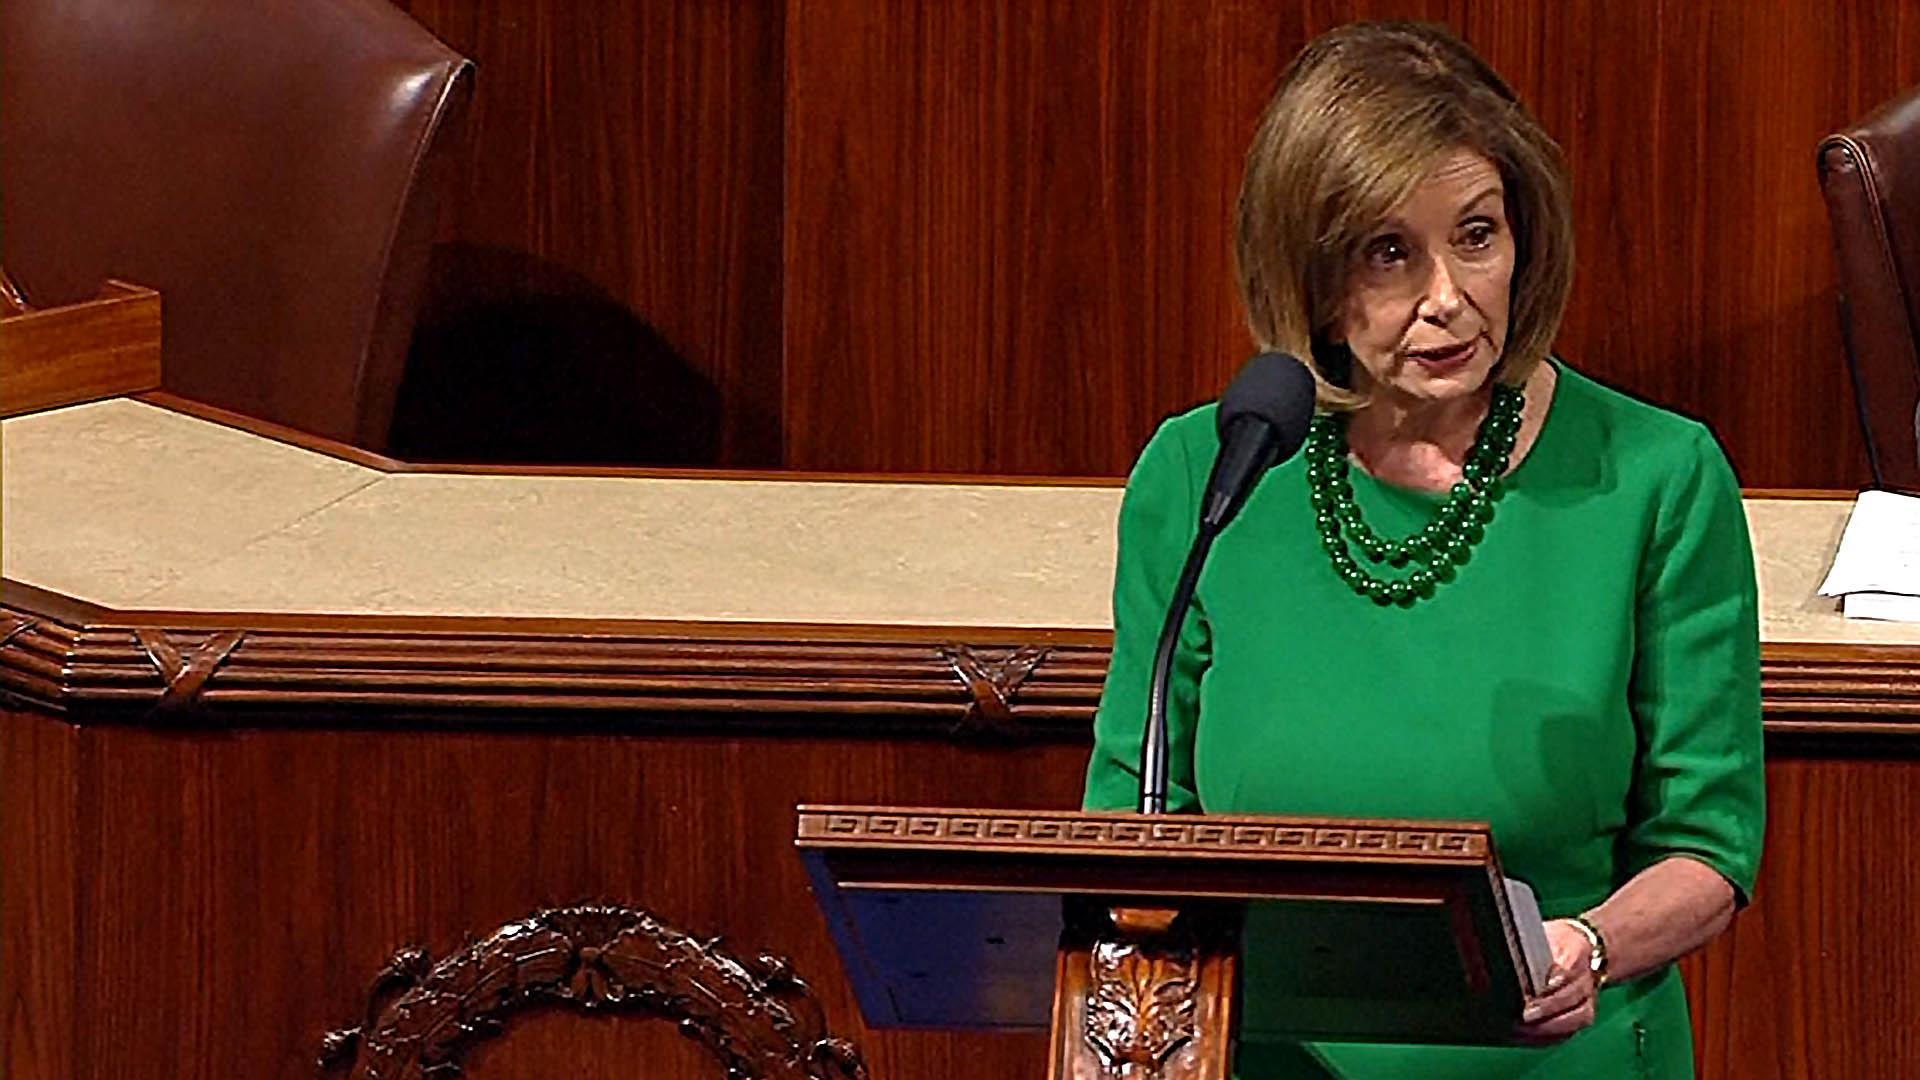 House passes border funding bill to address humanitarian crisis